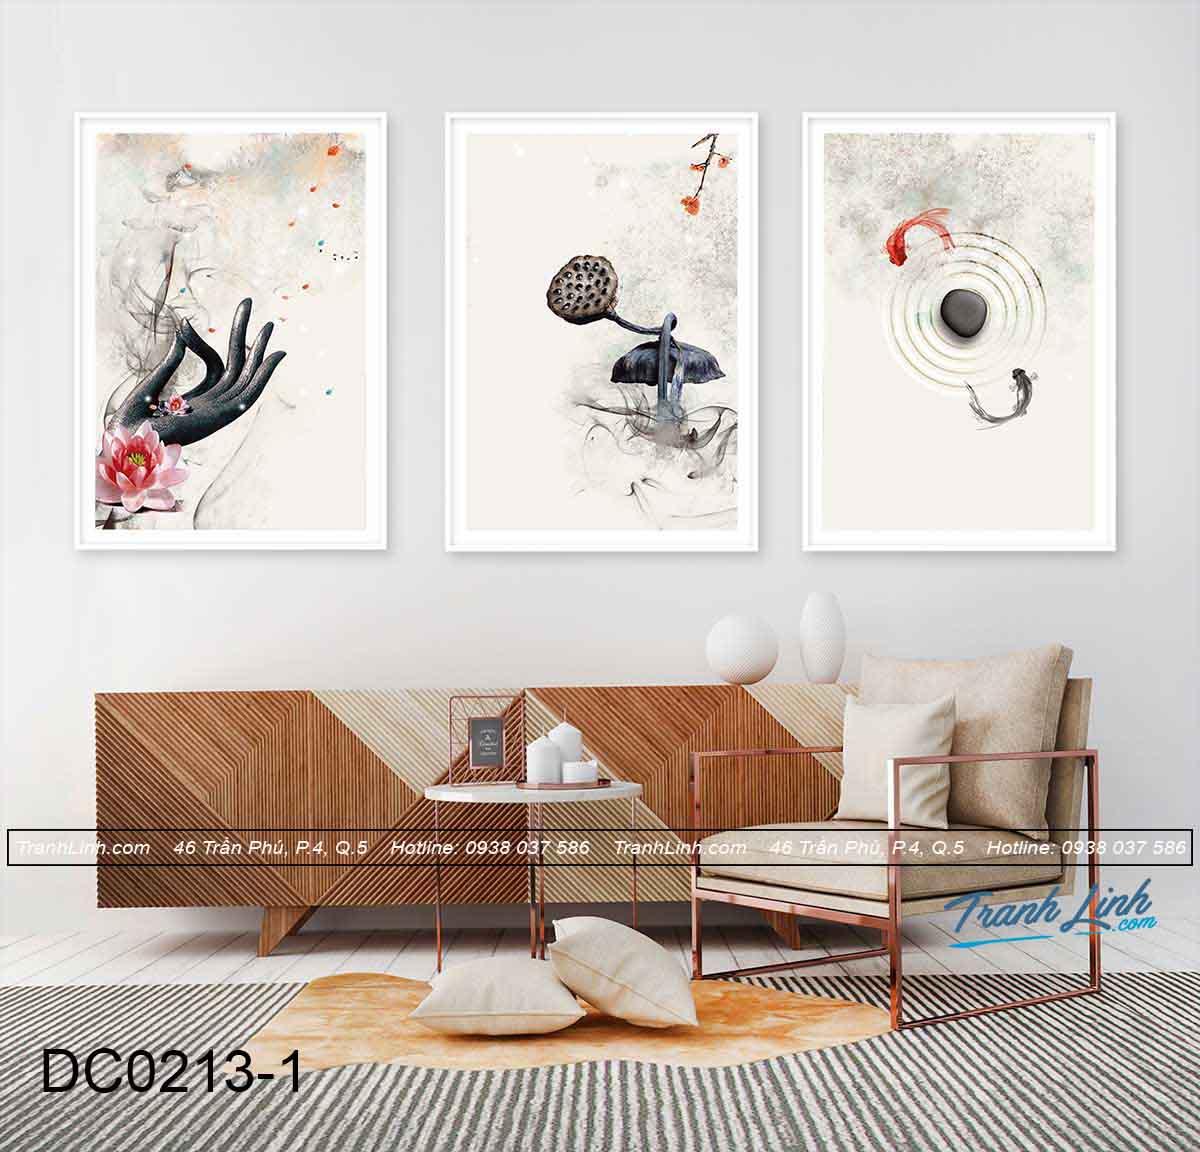 bo tranh canvas trang tri decor dc0213